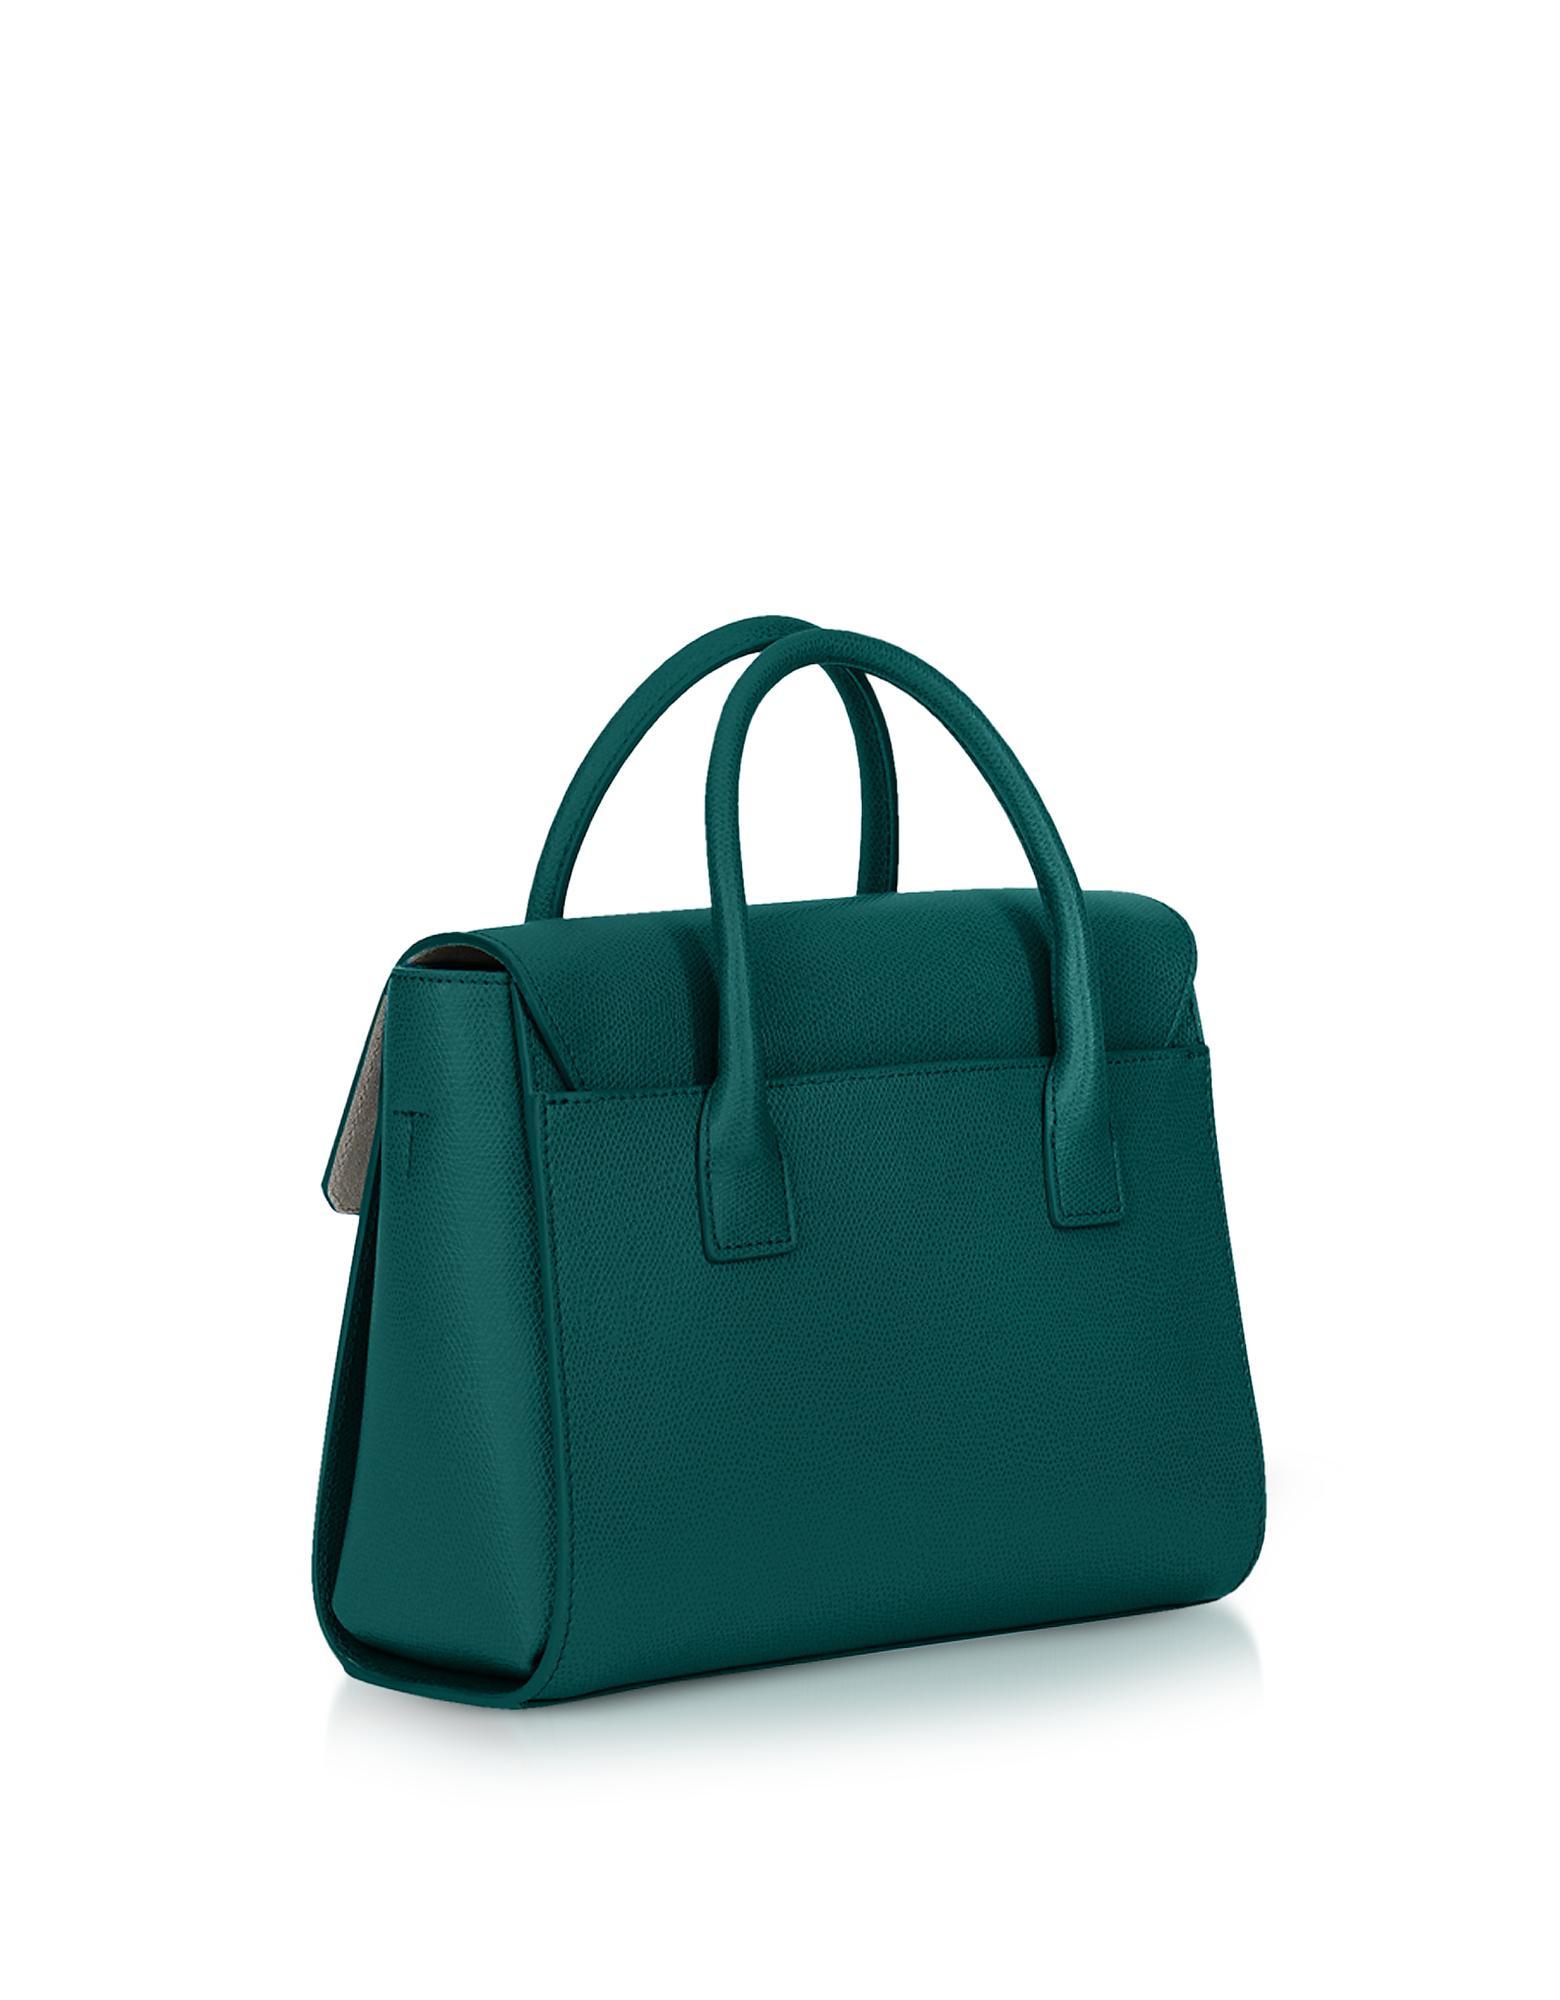 6aae86e43853 Lyst - Furla Genuine Leather Metropolis Small Satchel Bag in Green